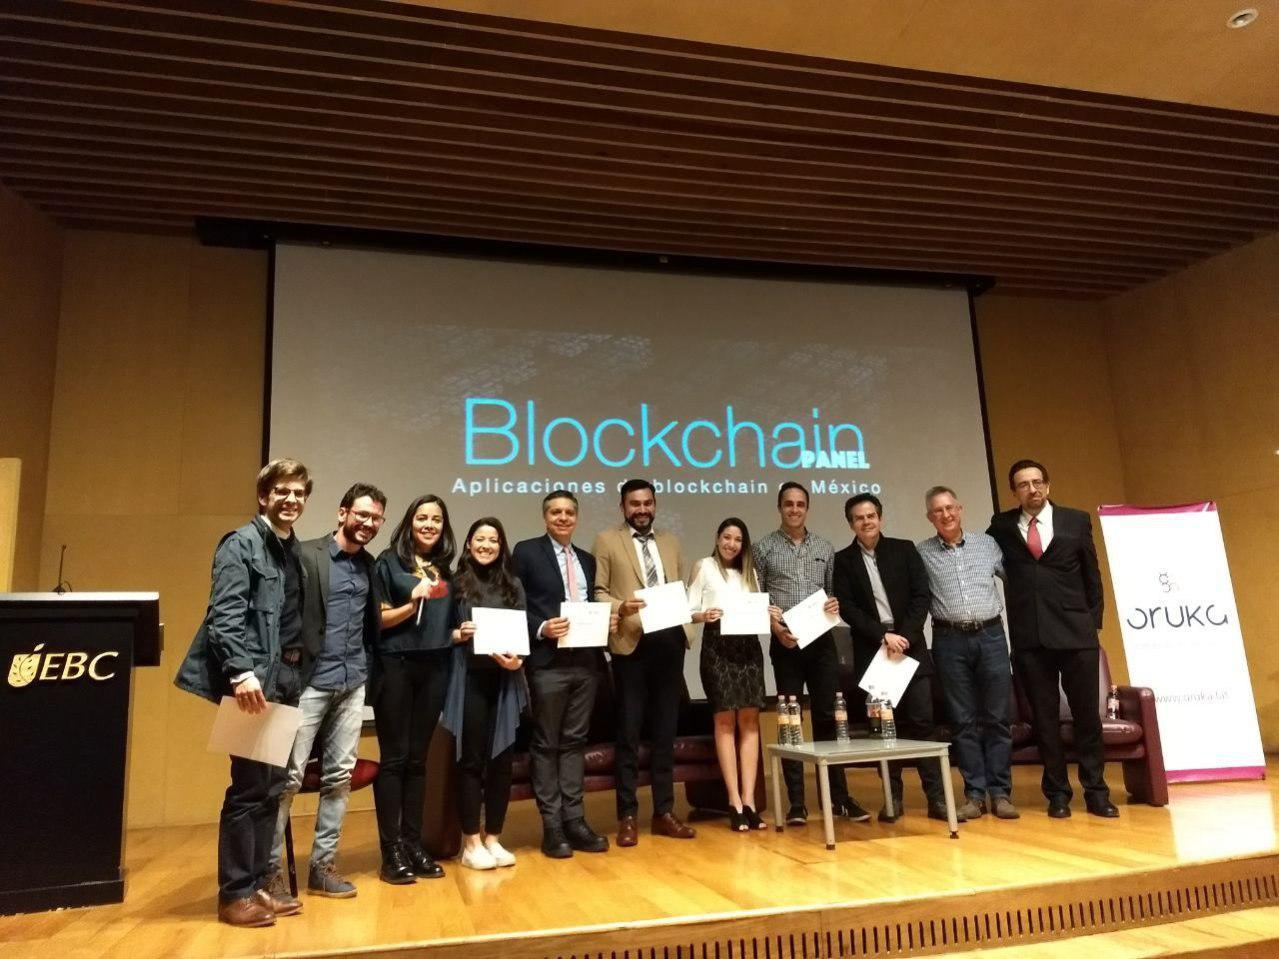 oruka-gba-latinoamerica-blockchain